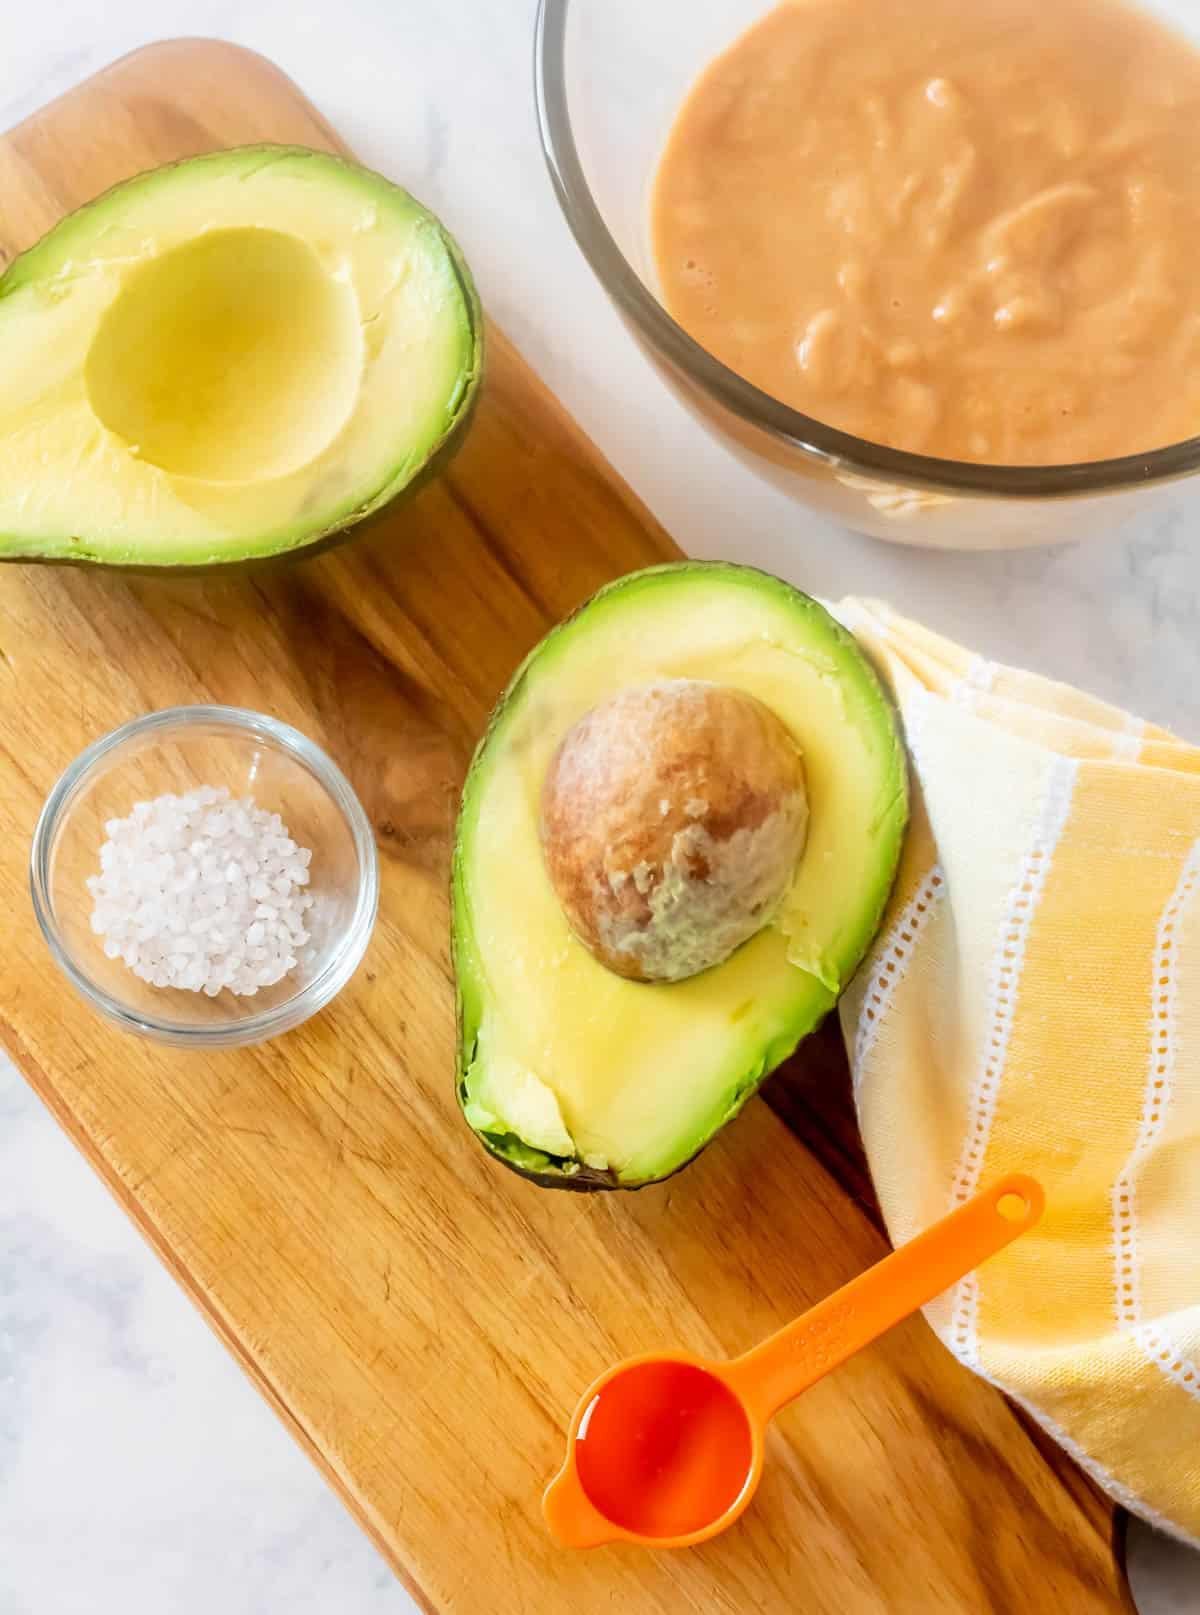 Ingredients for the ice cream: 1 large avocado, agave nectar, sea salt, cherimoya puree.